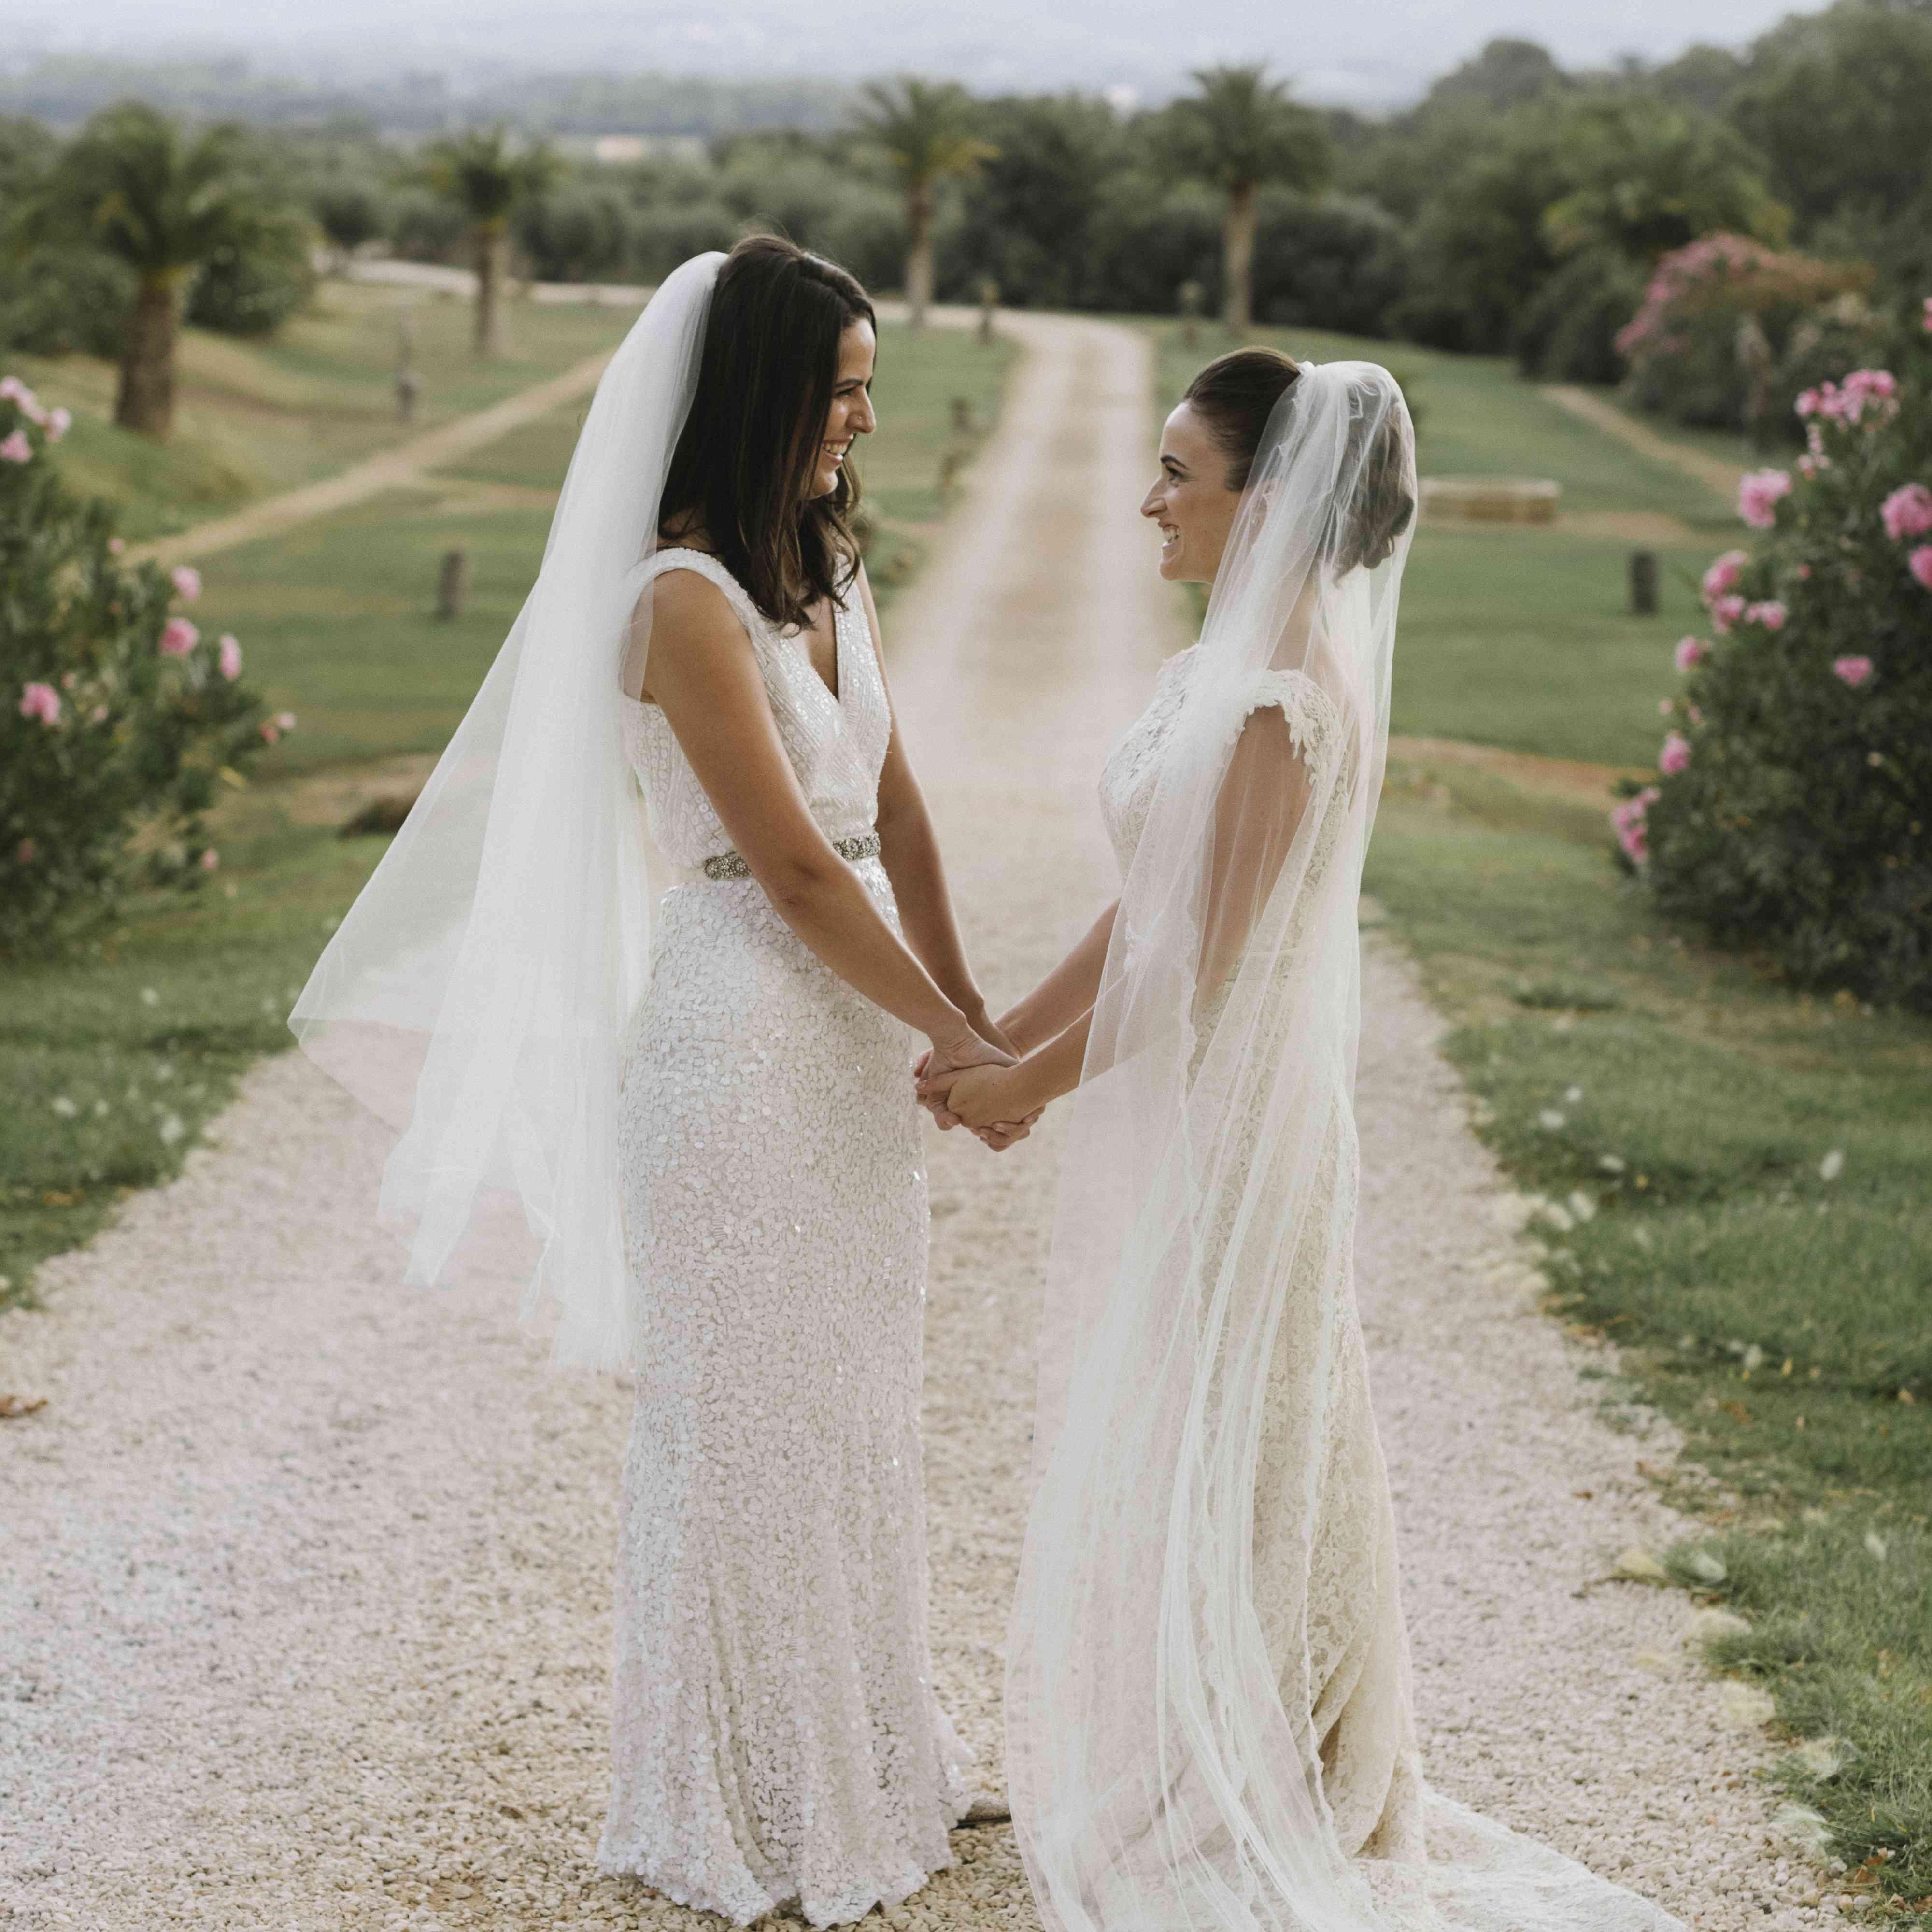 <p>brides wedding dresses</p><br><br>